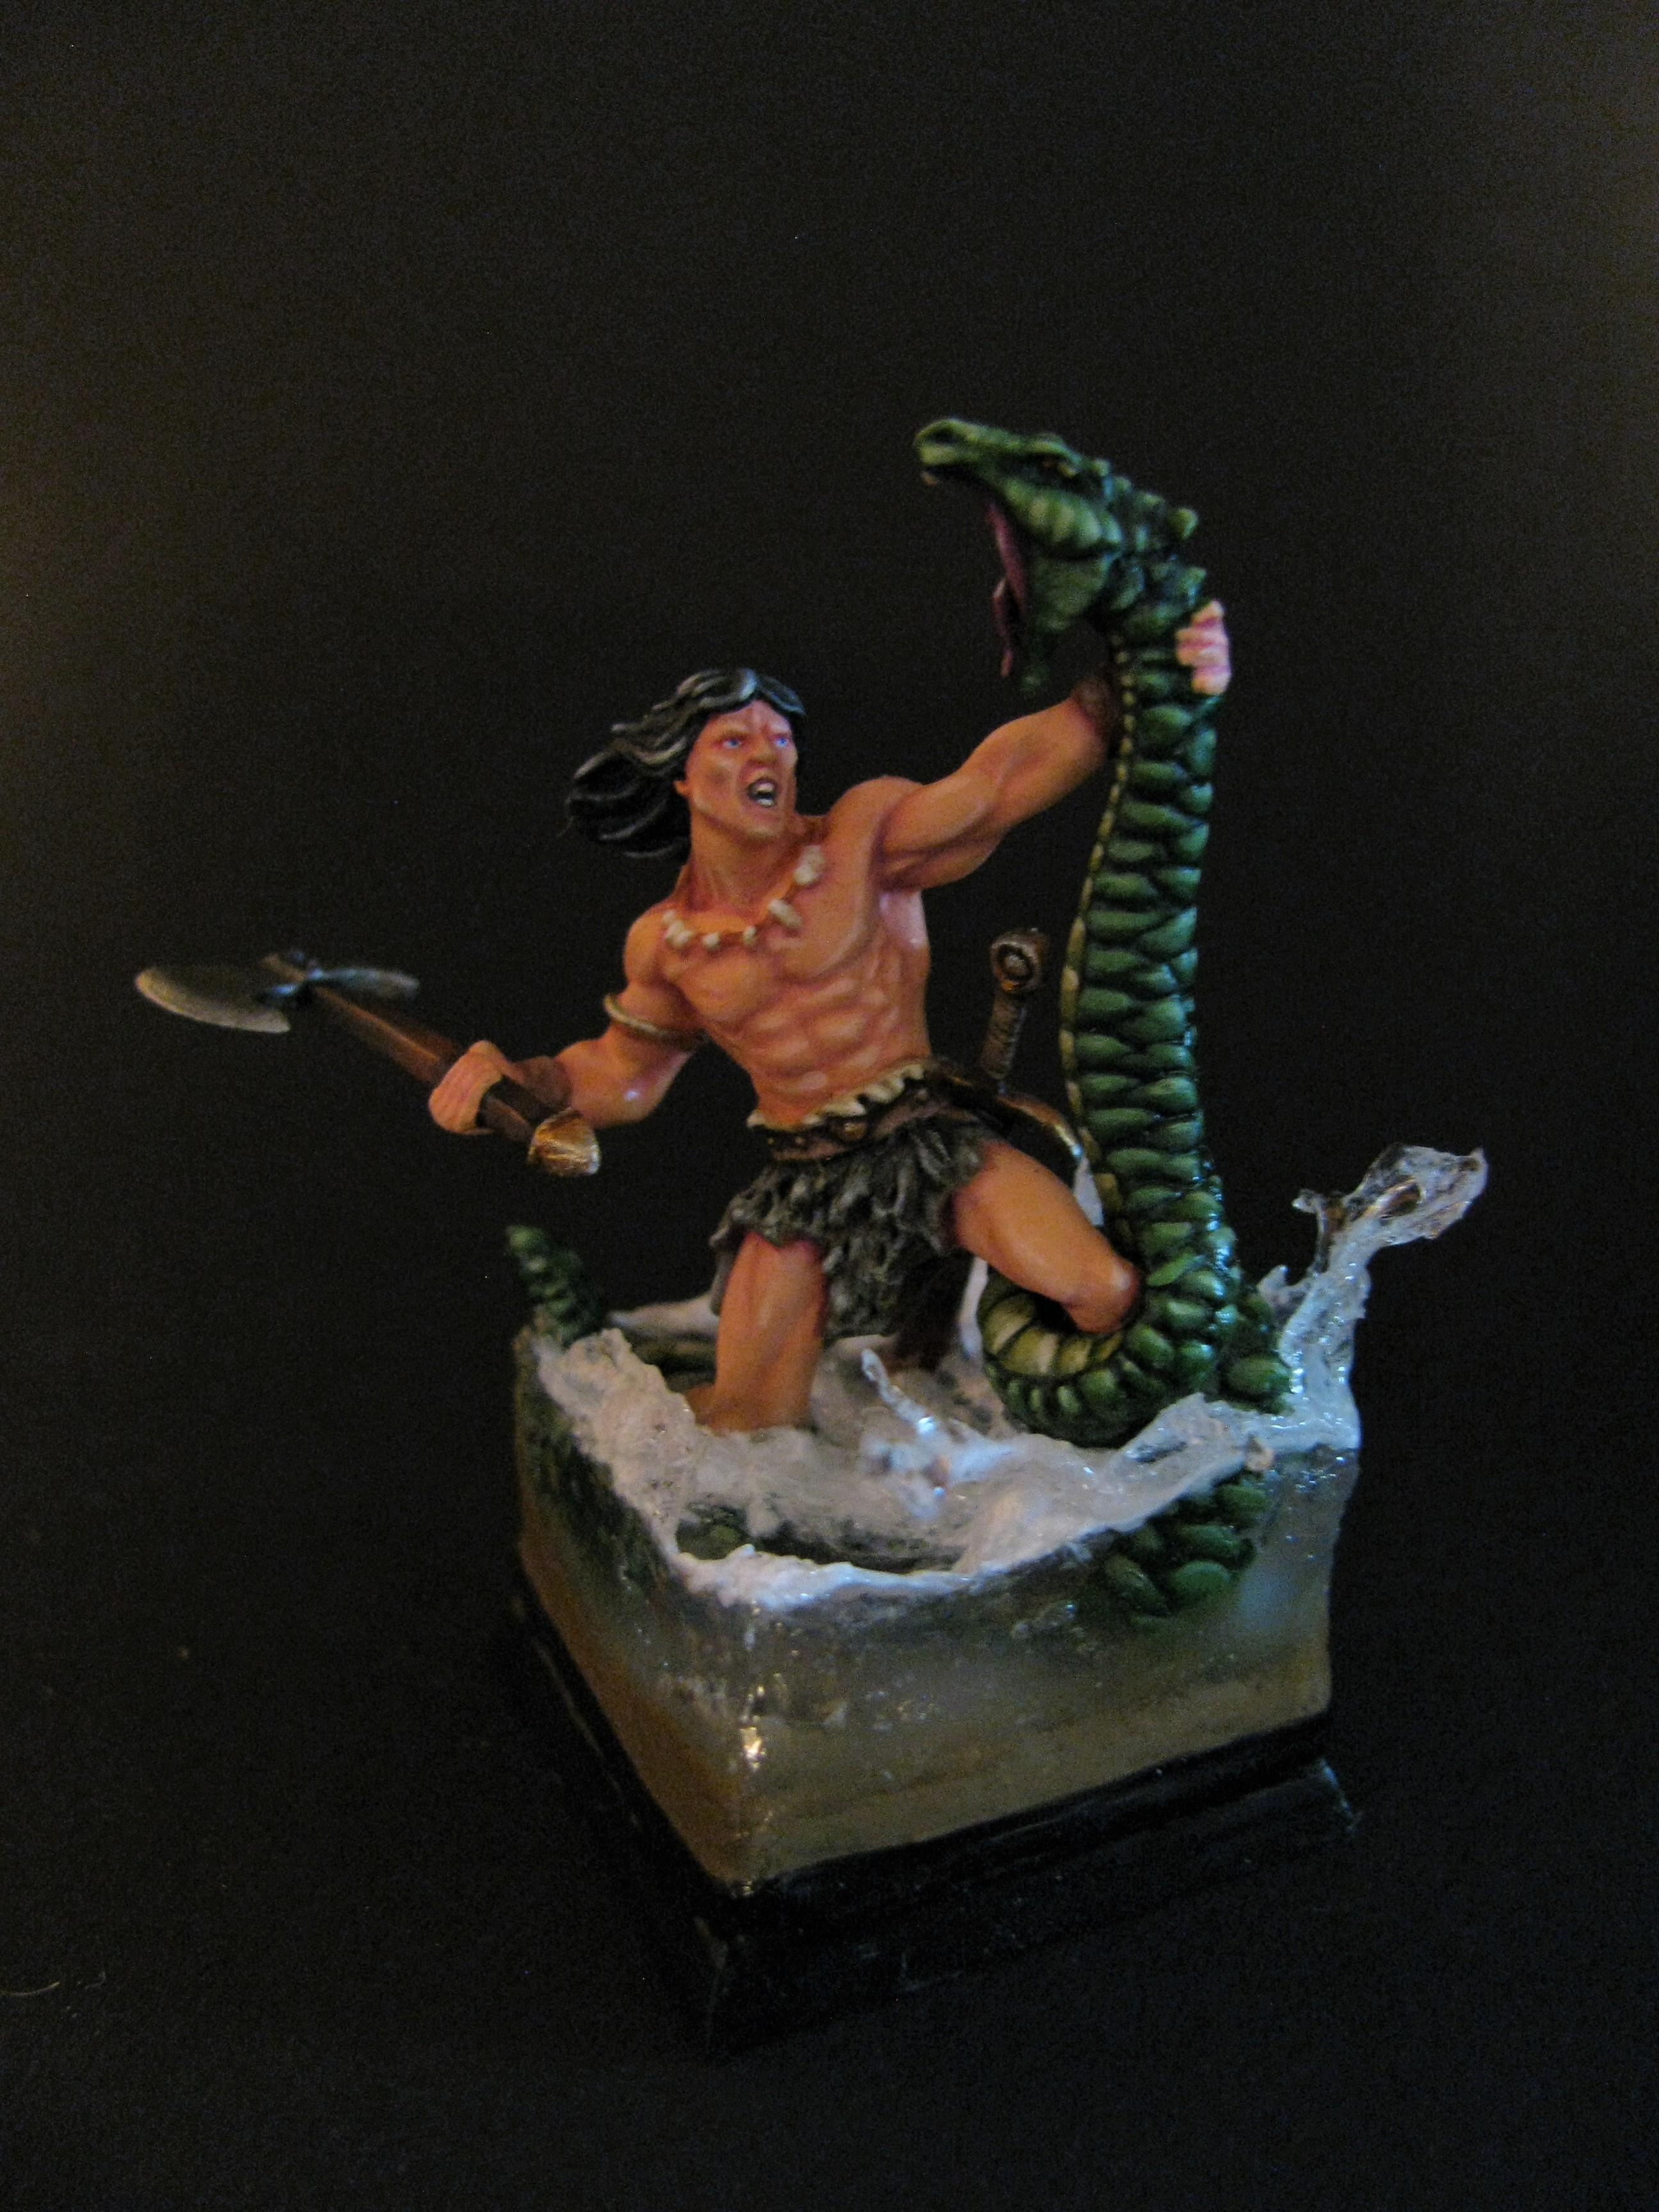 Conan fighting a watersnake